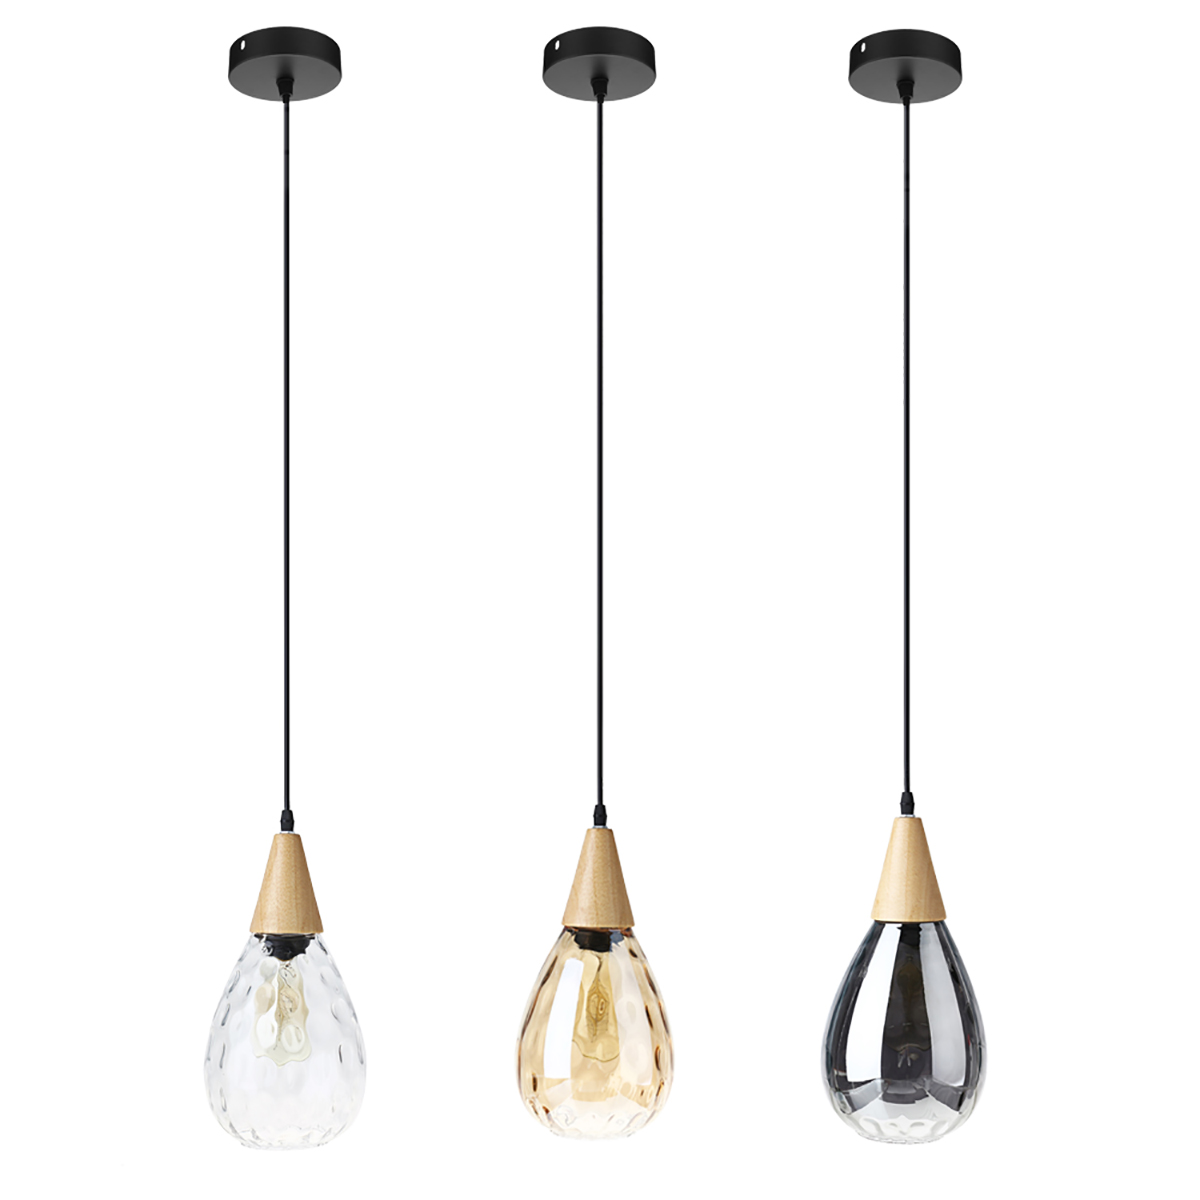 Modern Glass Pendant Light Lamp Living Room Home Decoration Restaurant Hanging Lighting Home Bar Drop Glass Fixture E27 220V